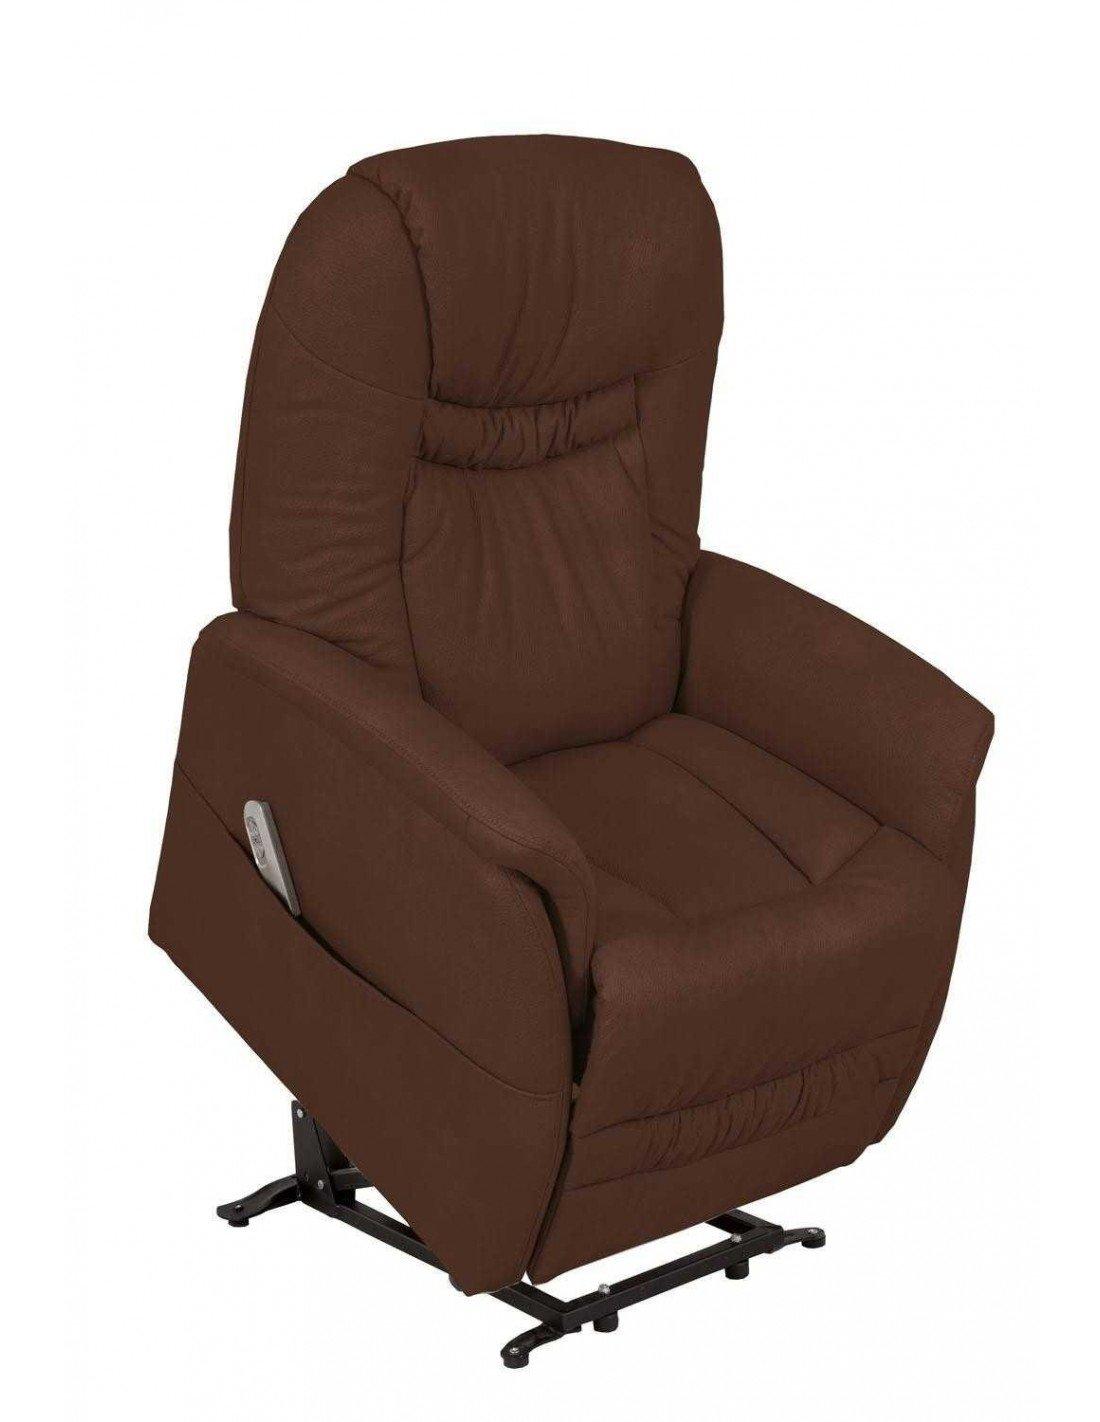 fauteuil releveur menton 2 moteurs cacao espry medical. Black Bedroom Furniture Sets. Home Design Ideas